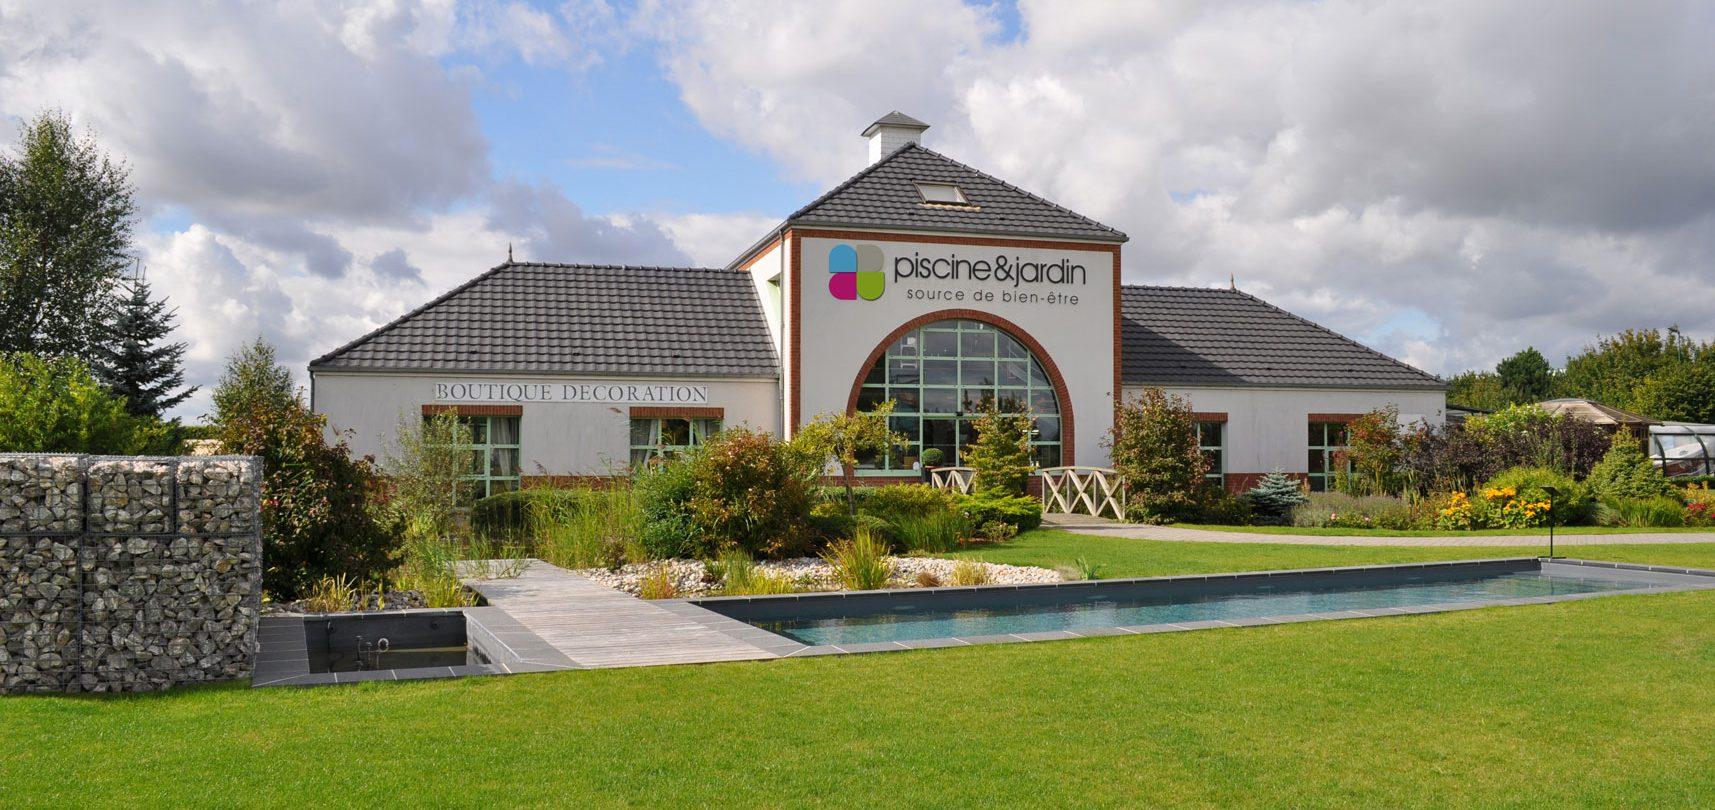 Piscine et jardin arras constructeur piscine arrageois for Salon piscine et jardin